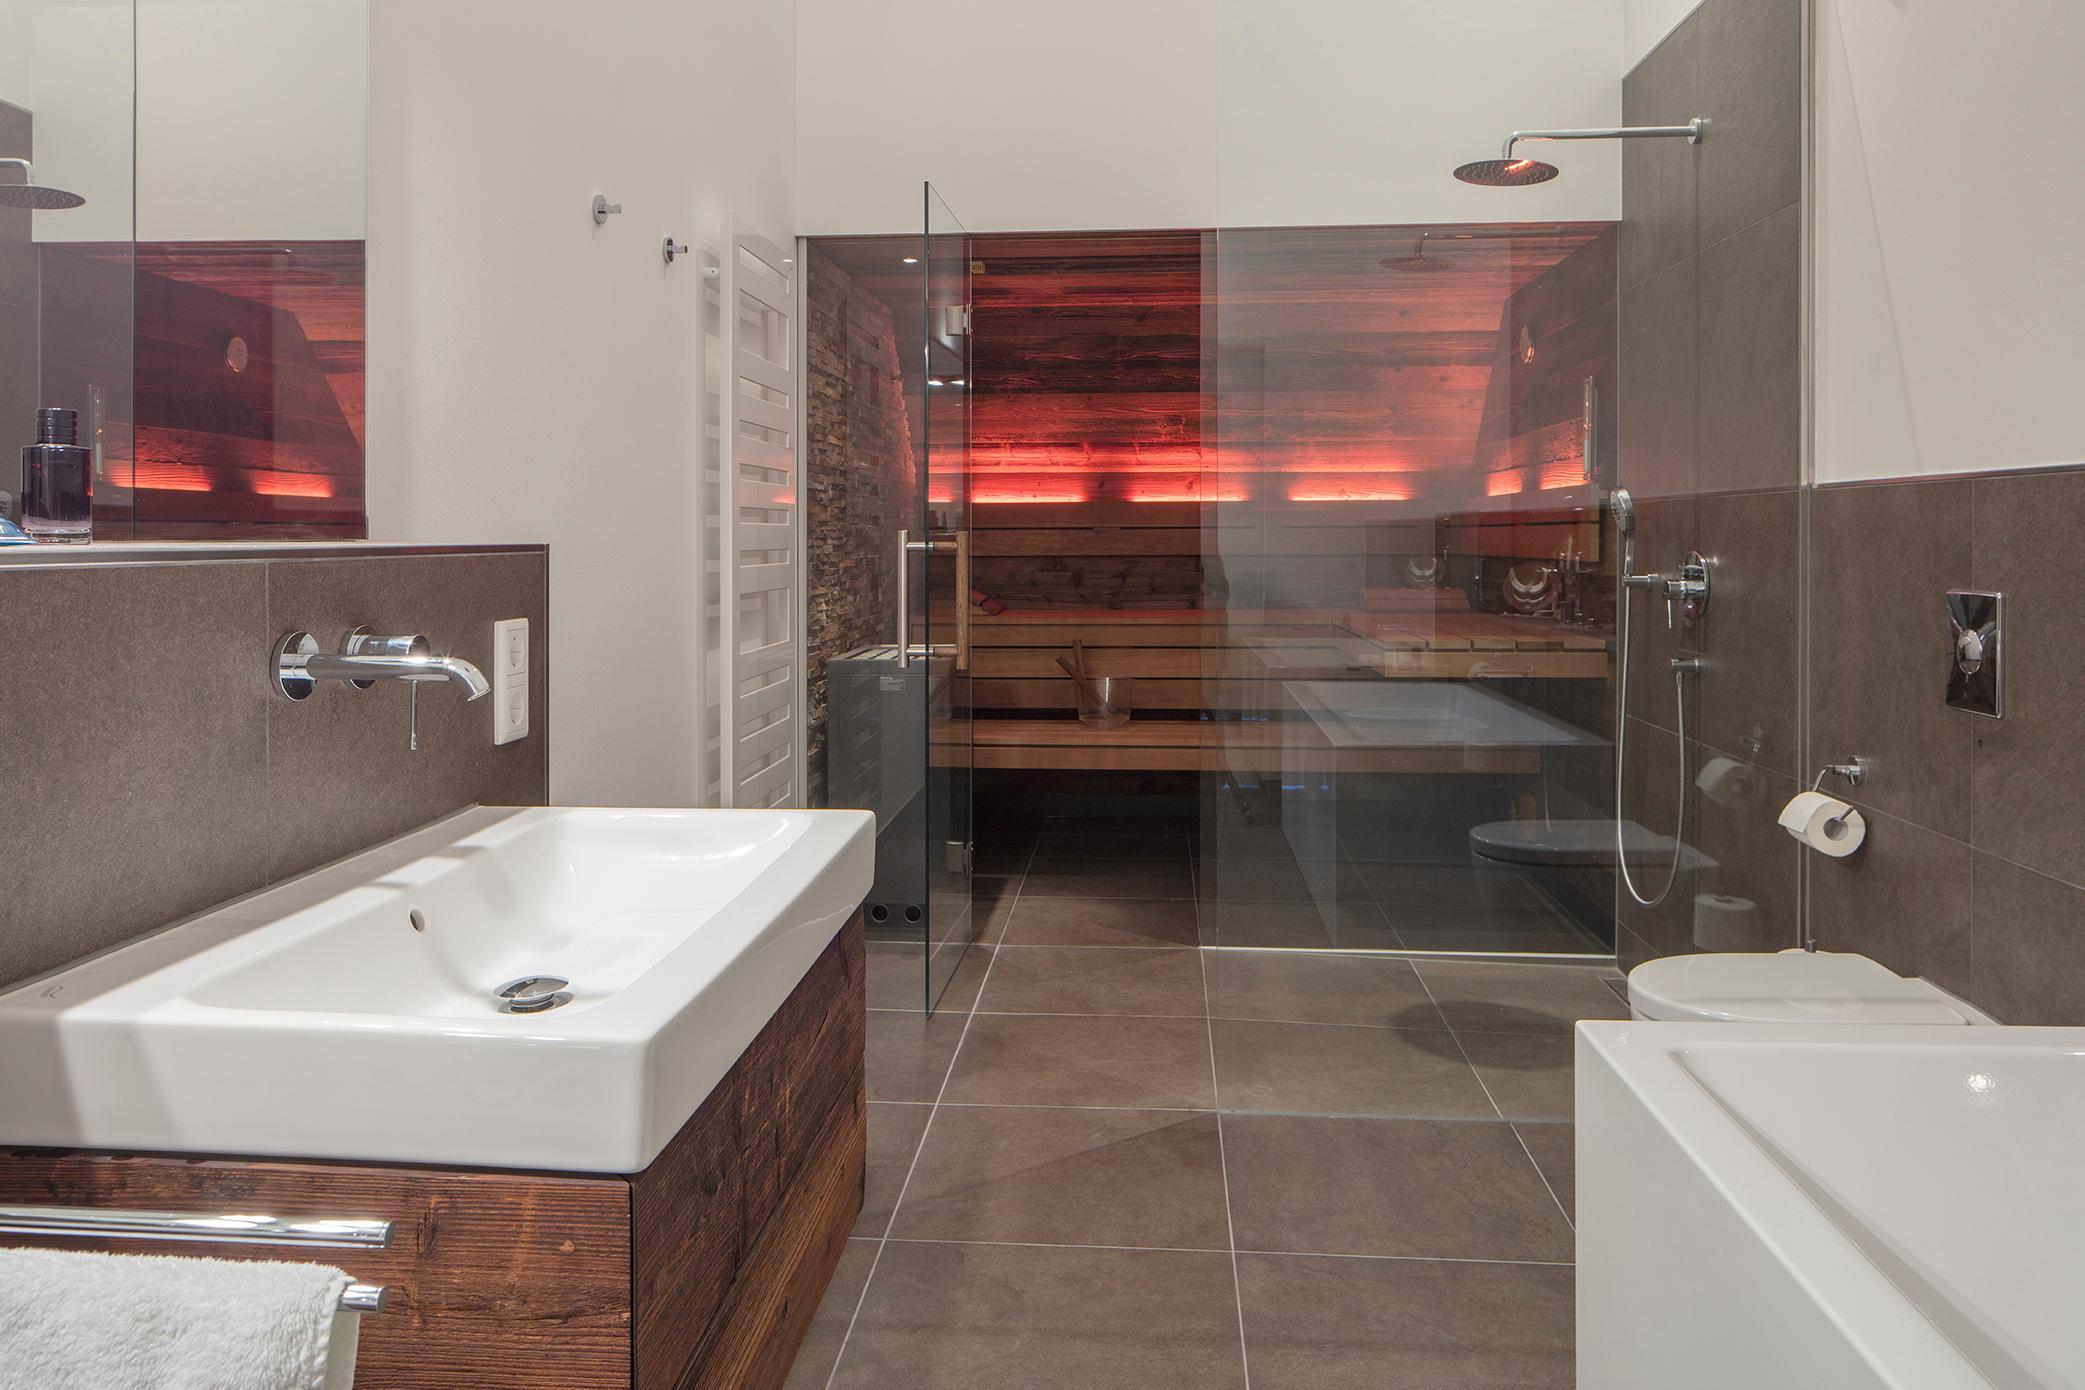 badsauna bilder ideen couchstyle. Black Bedroom Furniture Sets. Home Design Ideas